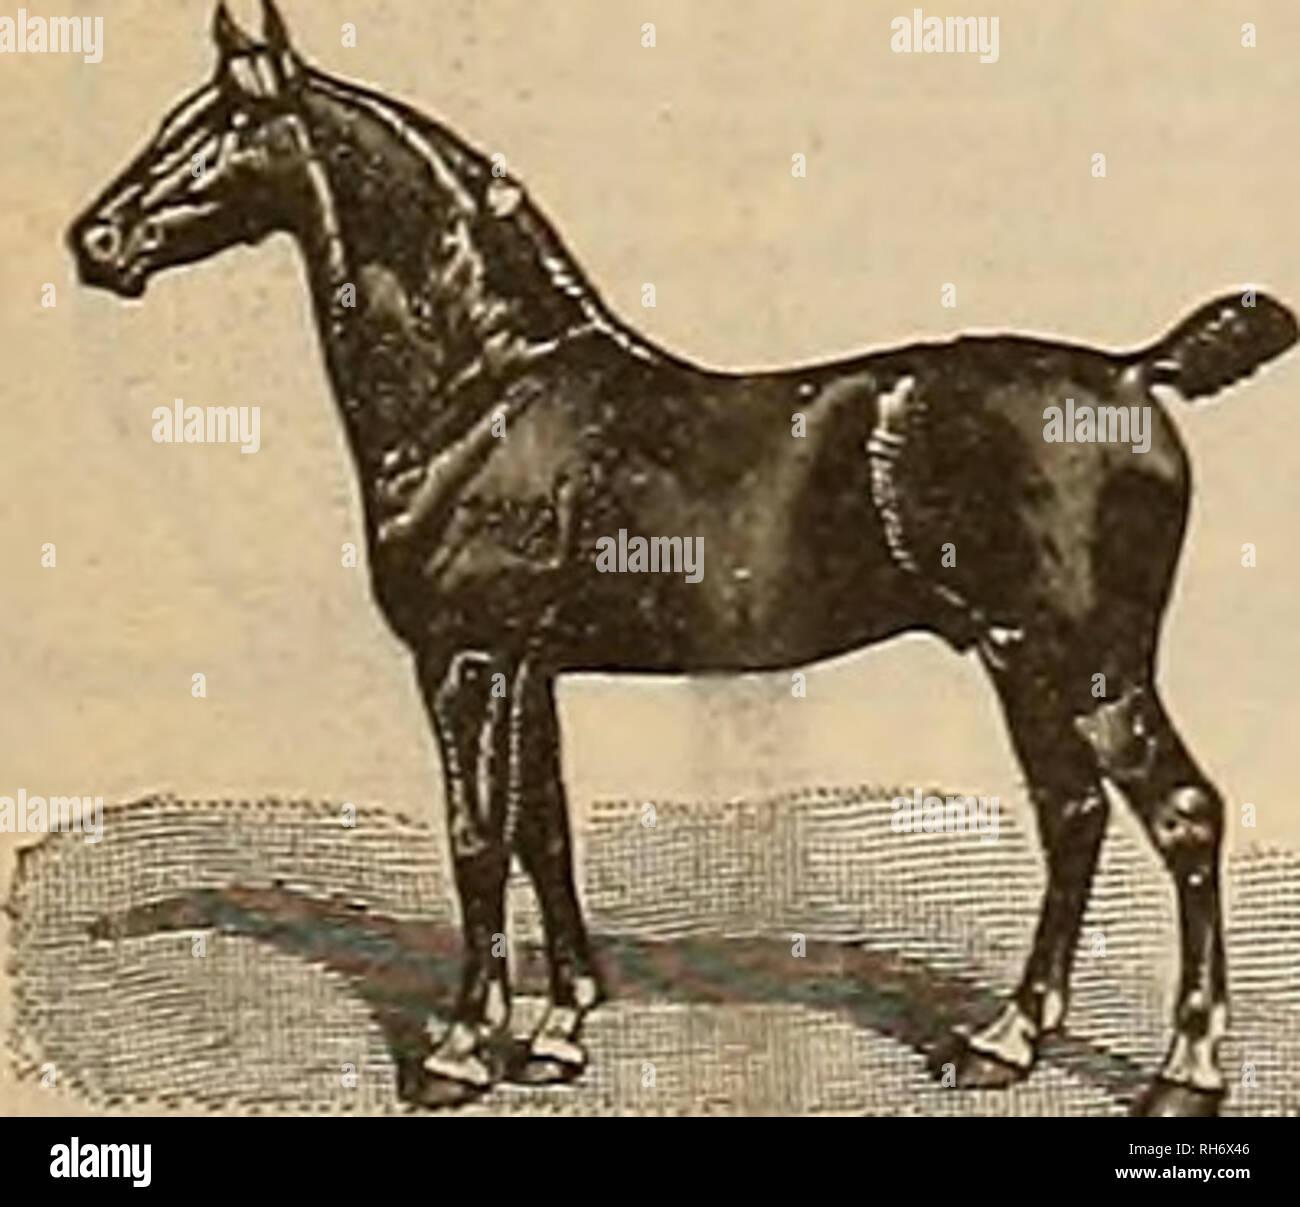 Breeder and sportsman  Horses  June 3, 1905j ©he gJre£t«ev anf